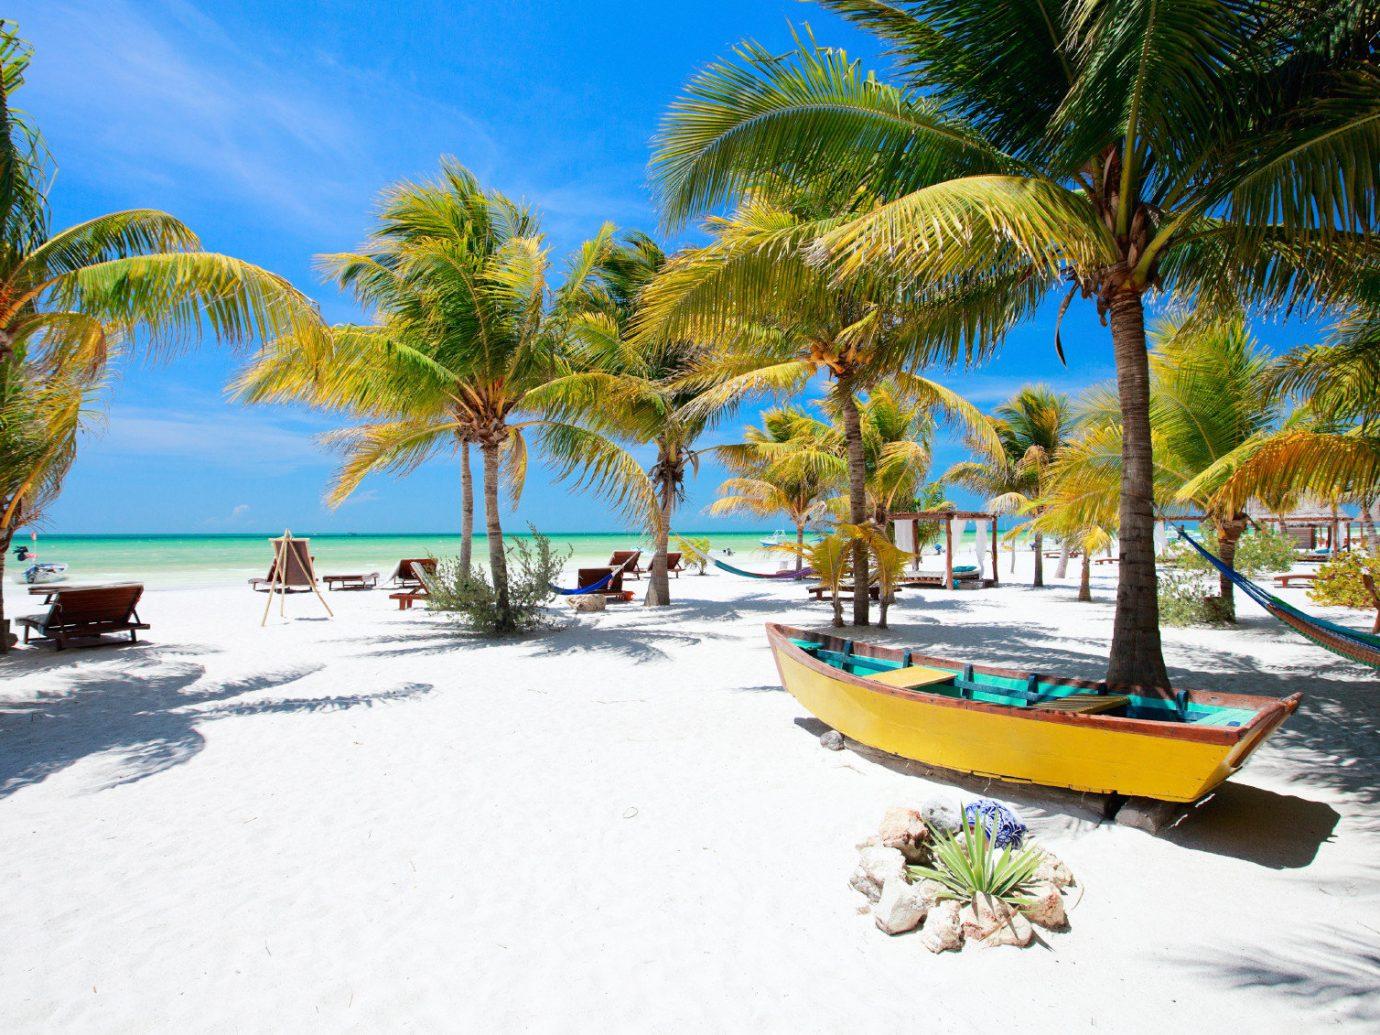 Hotels Trip Ideas tree outdoor sky Beach water palm leisure Resort caribbean vacation arecales Sea Ocean Pool Lagoon bay tropics Island plant shore sandy lined